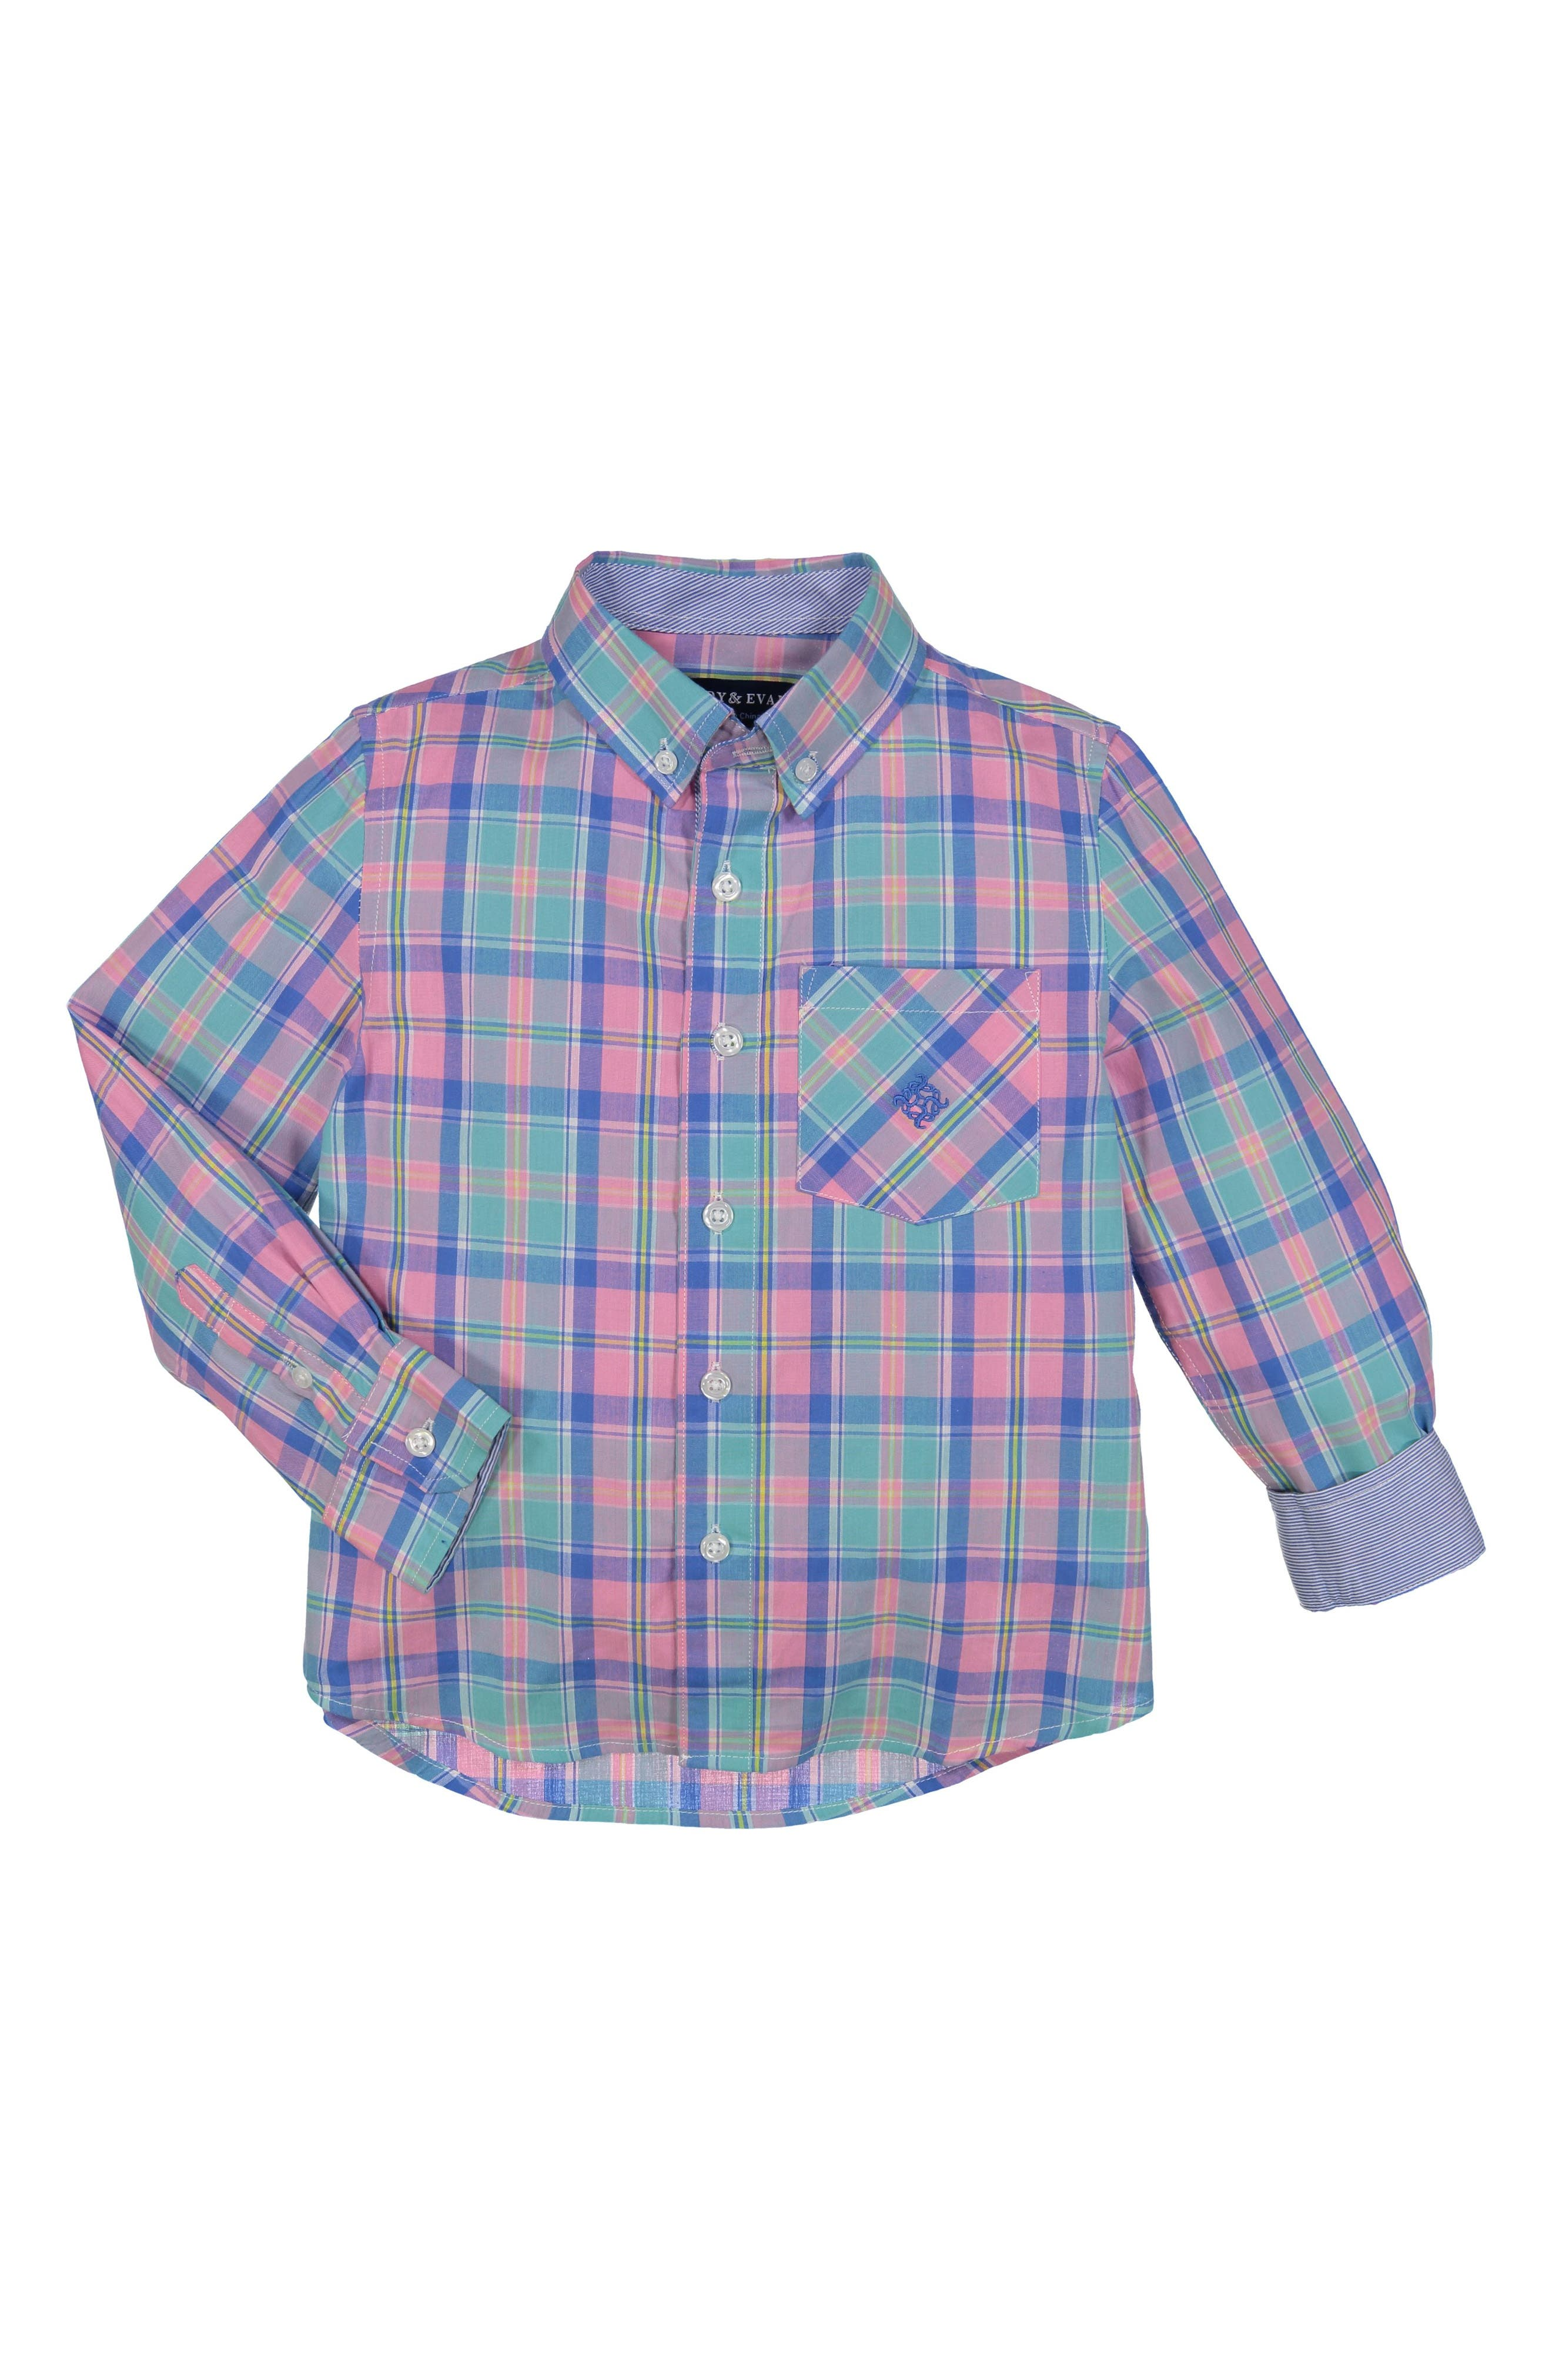 Easter Plaid Woven Shirt,                             Main thumbnail 1, color,                             Pink